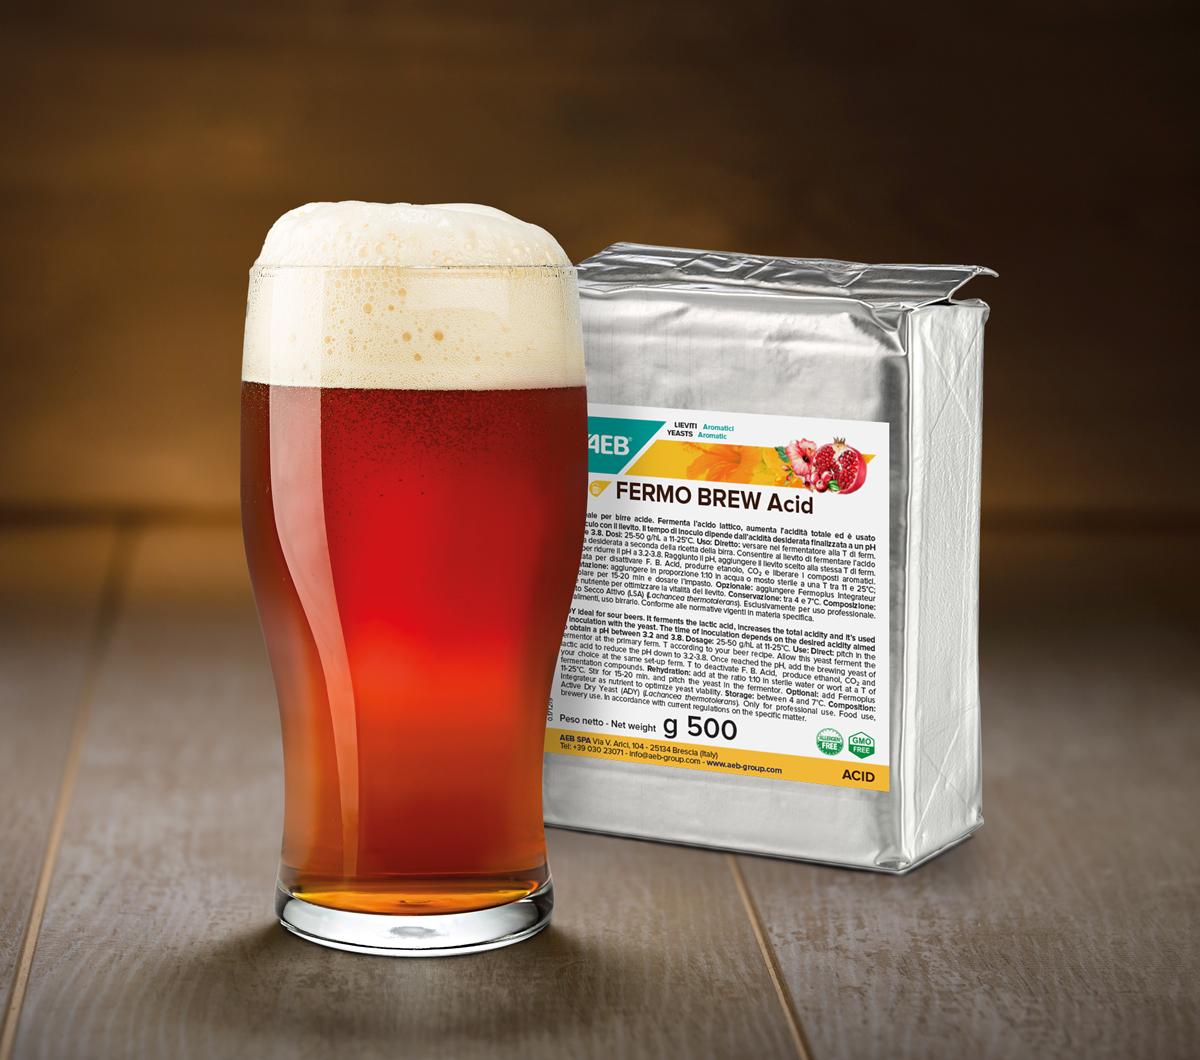 FERMO BREW ACID增酸酵母: 酿造酸啤酒的完美选择